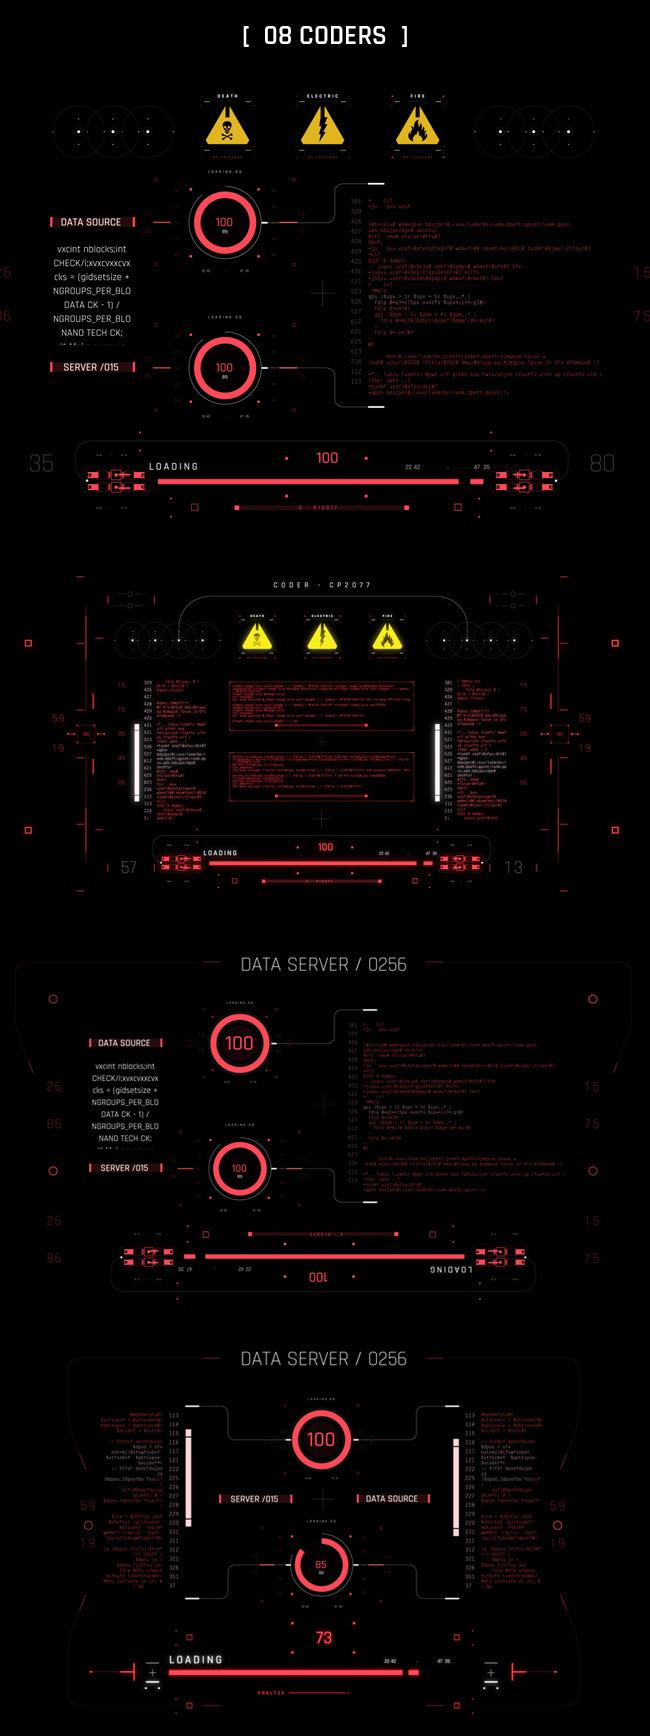 AE脚本-500个HUD高科技赛博朋克UI科幻界面元素动画预设包 Cyberpunk HUD UI 500+ 已修复中文版AE表达式报错插图32